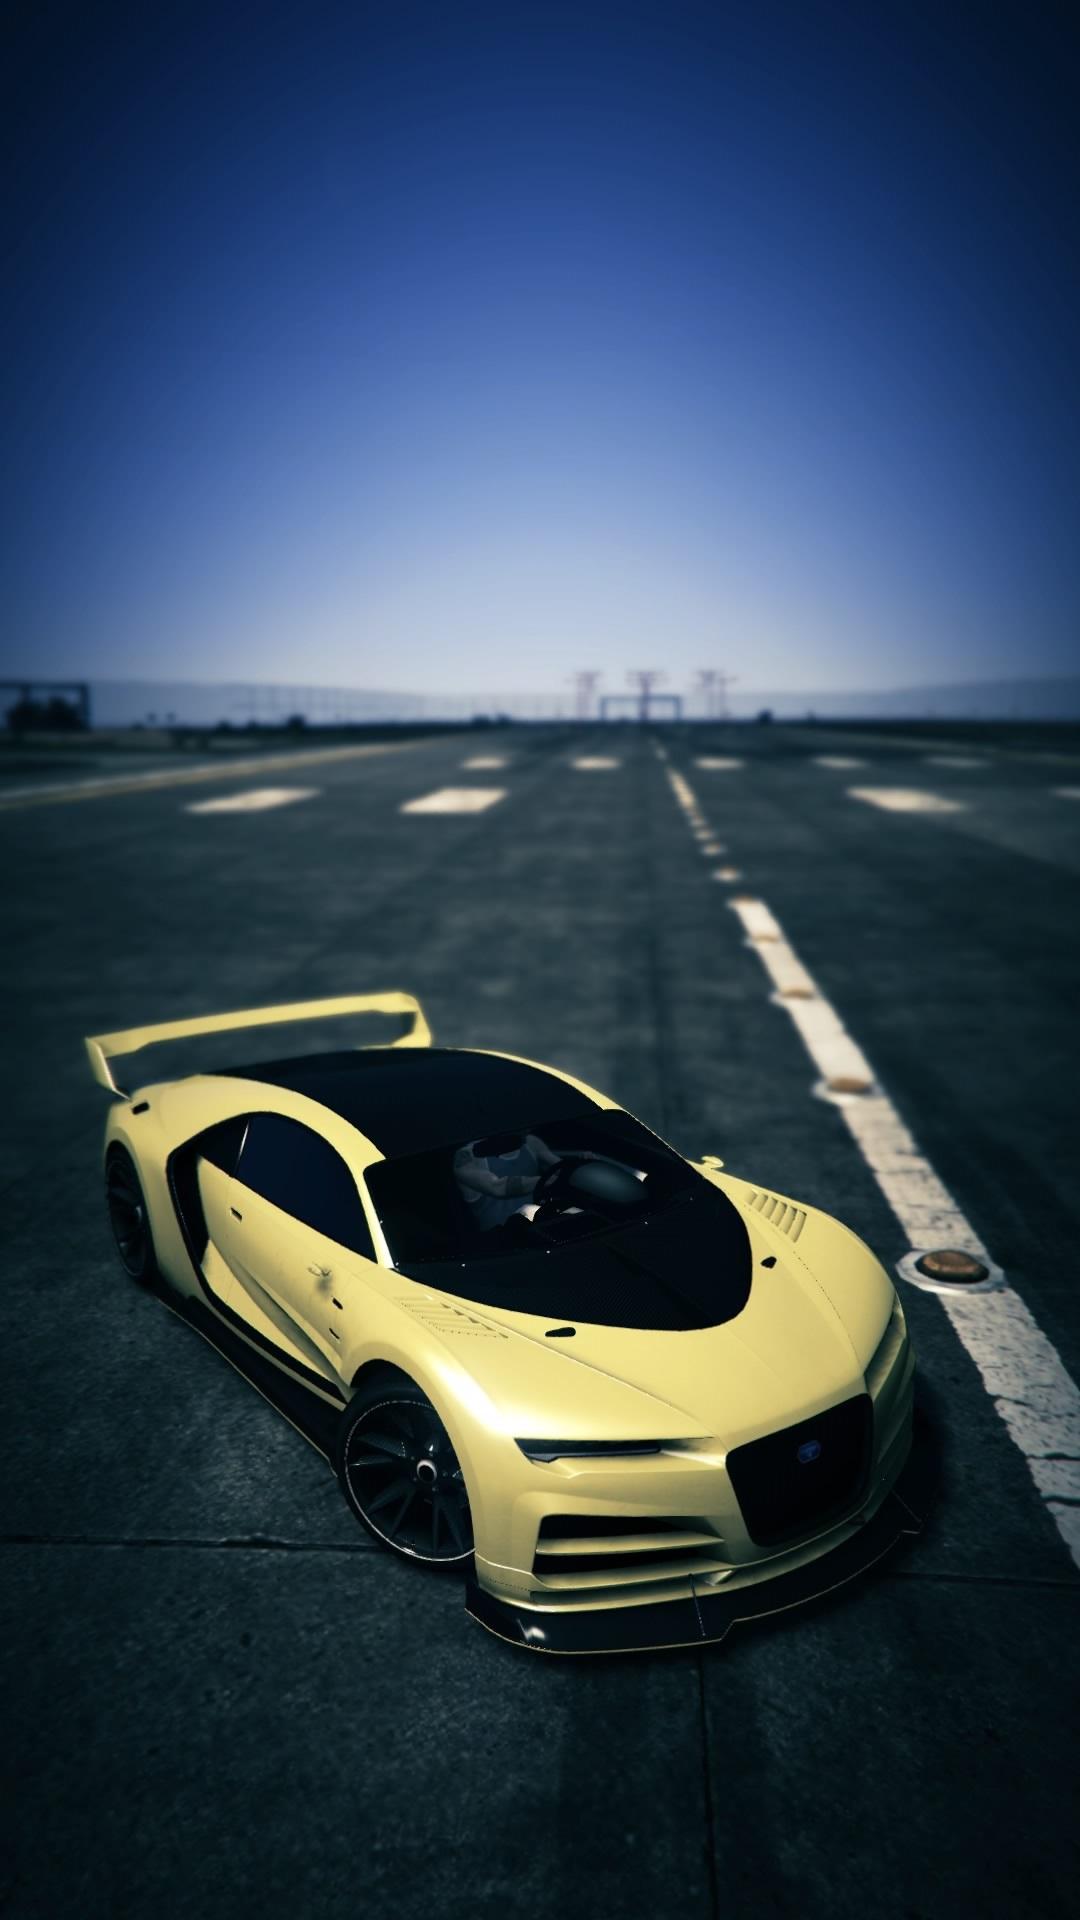 Grand_Theft_Auto_V_20170722110900.jpg